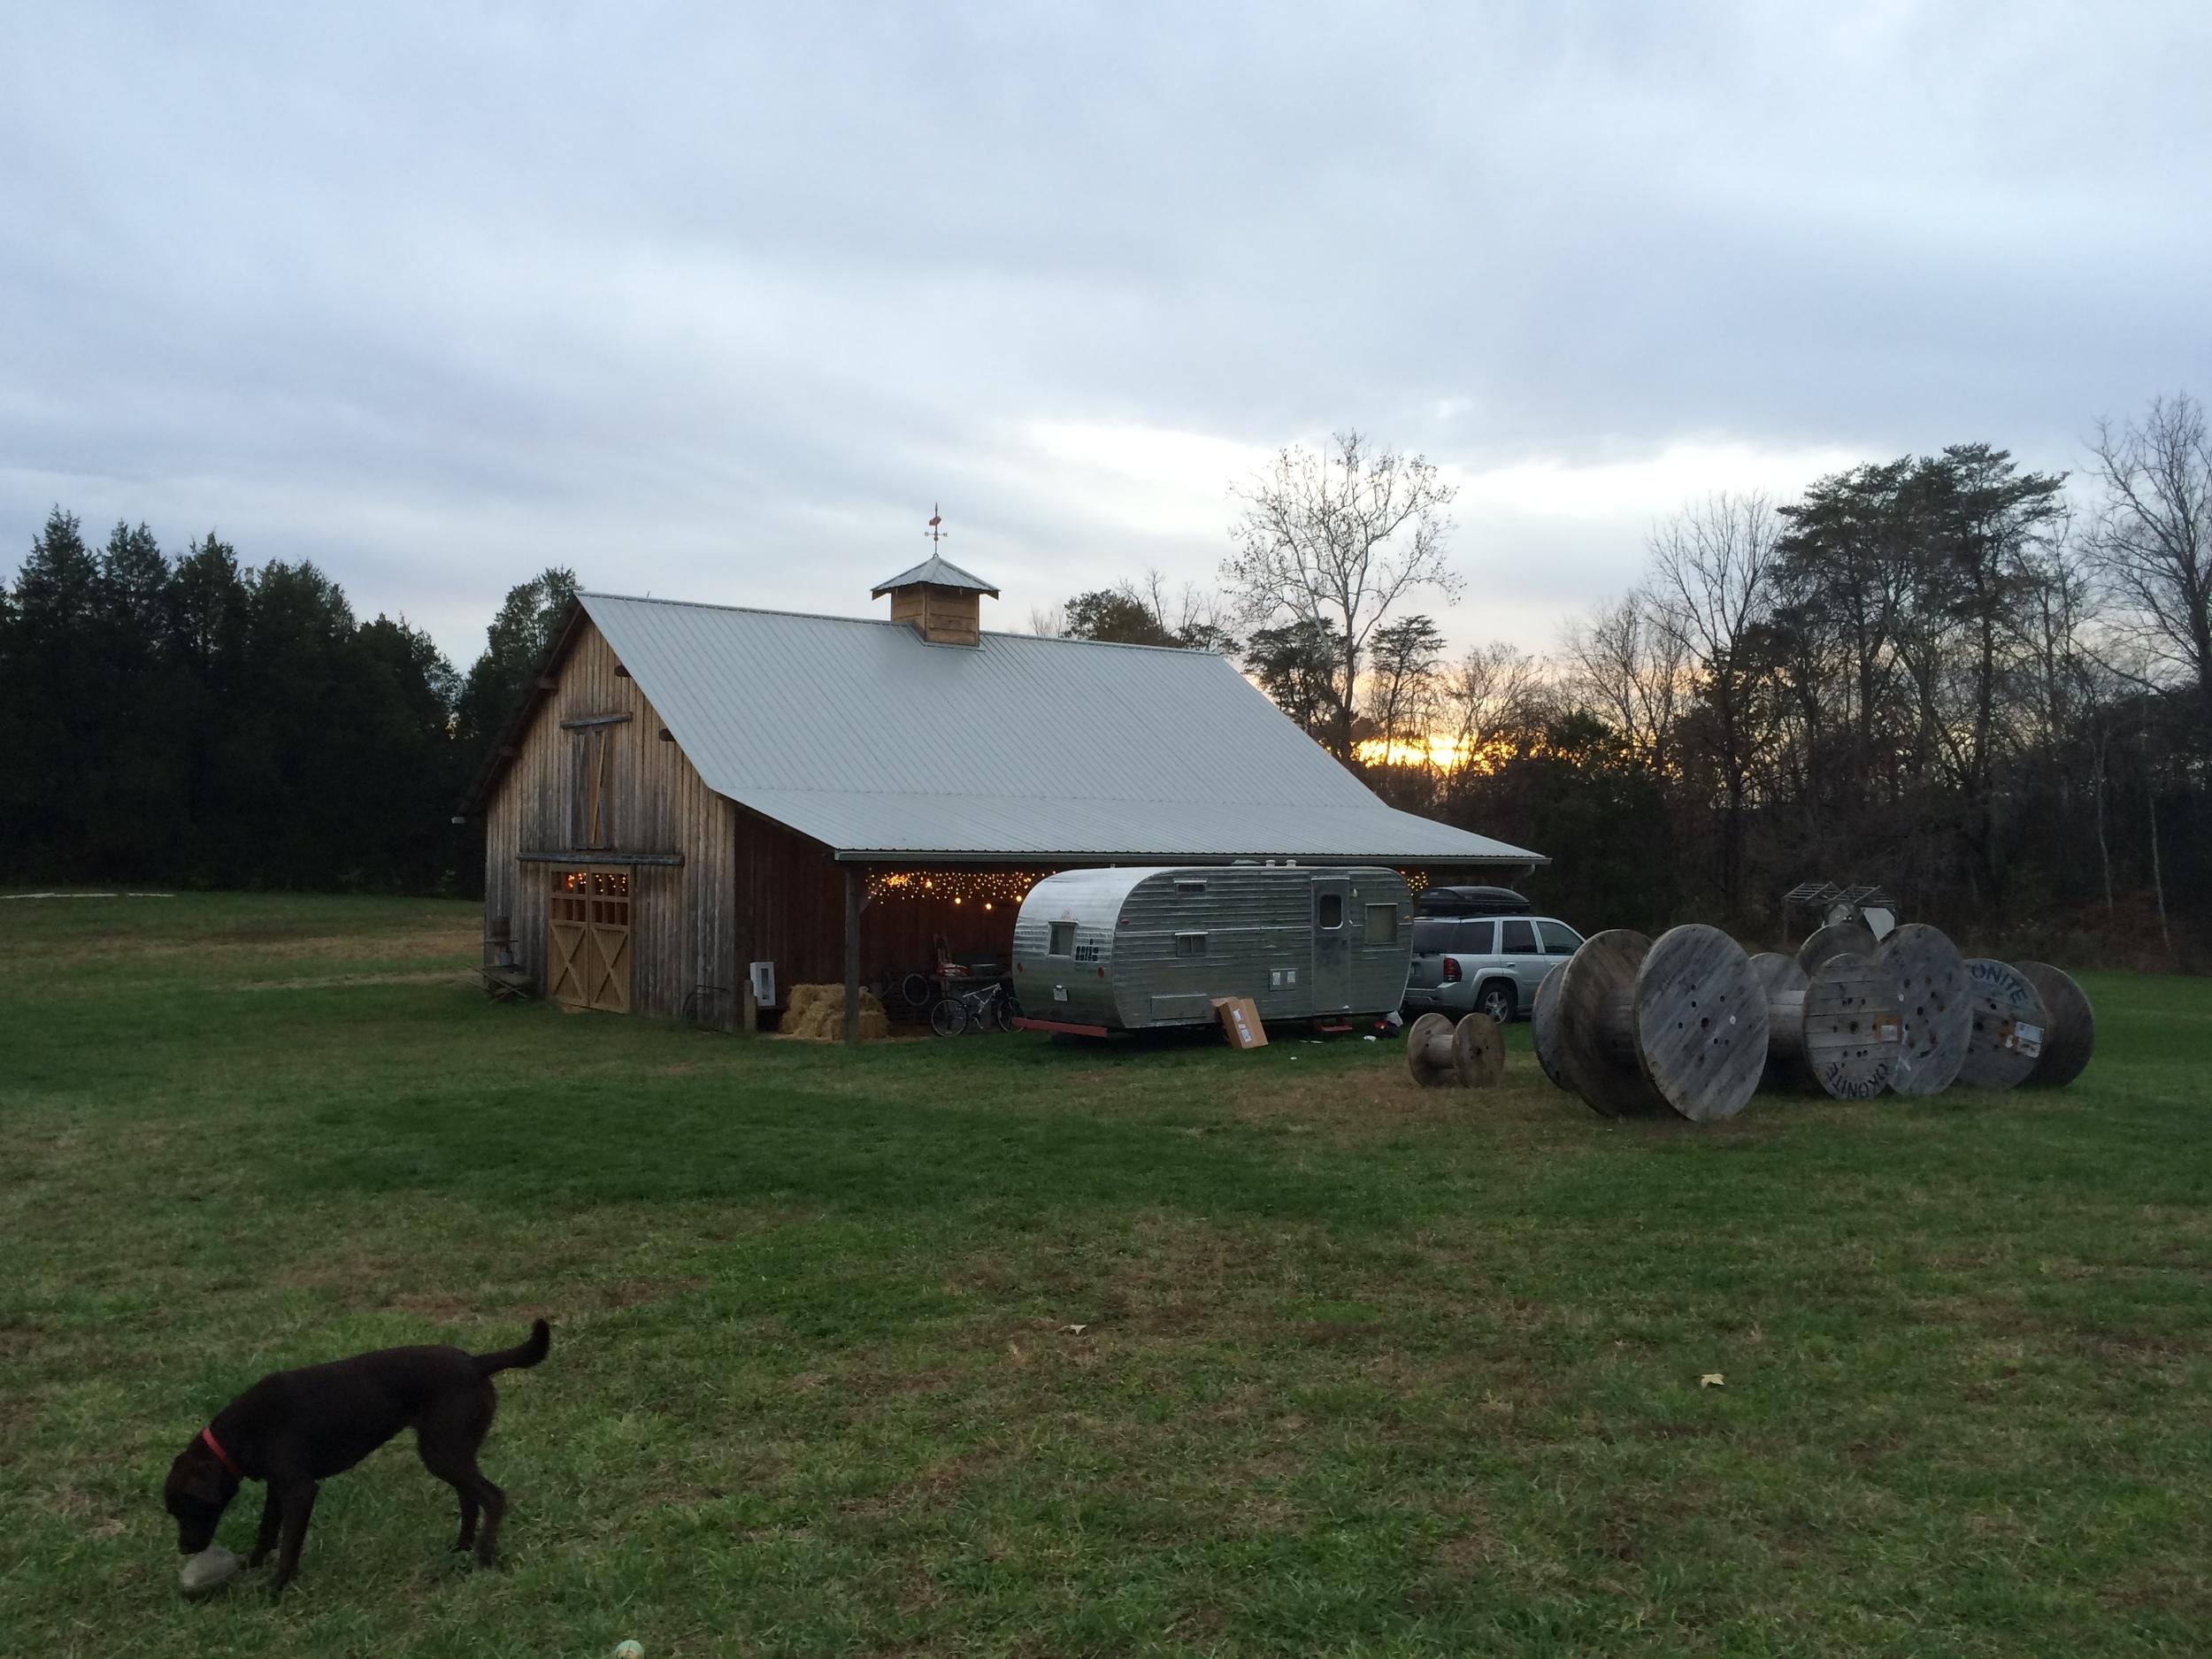 The barn at Roseberry Farms